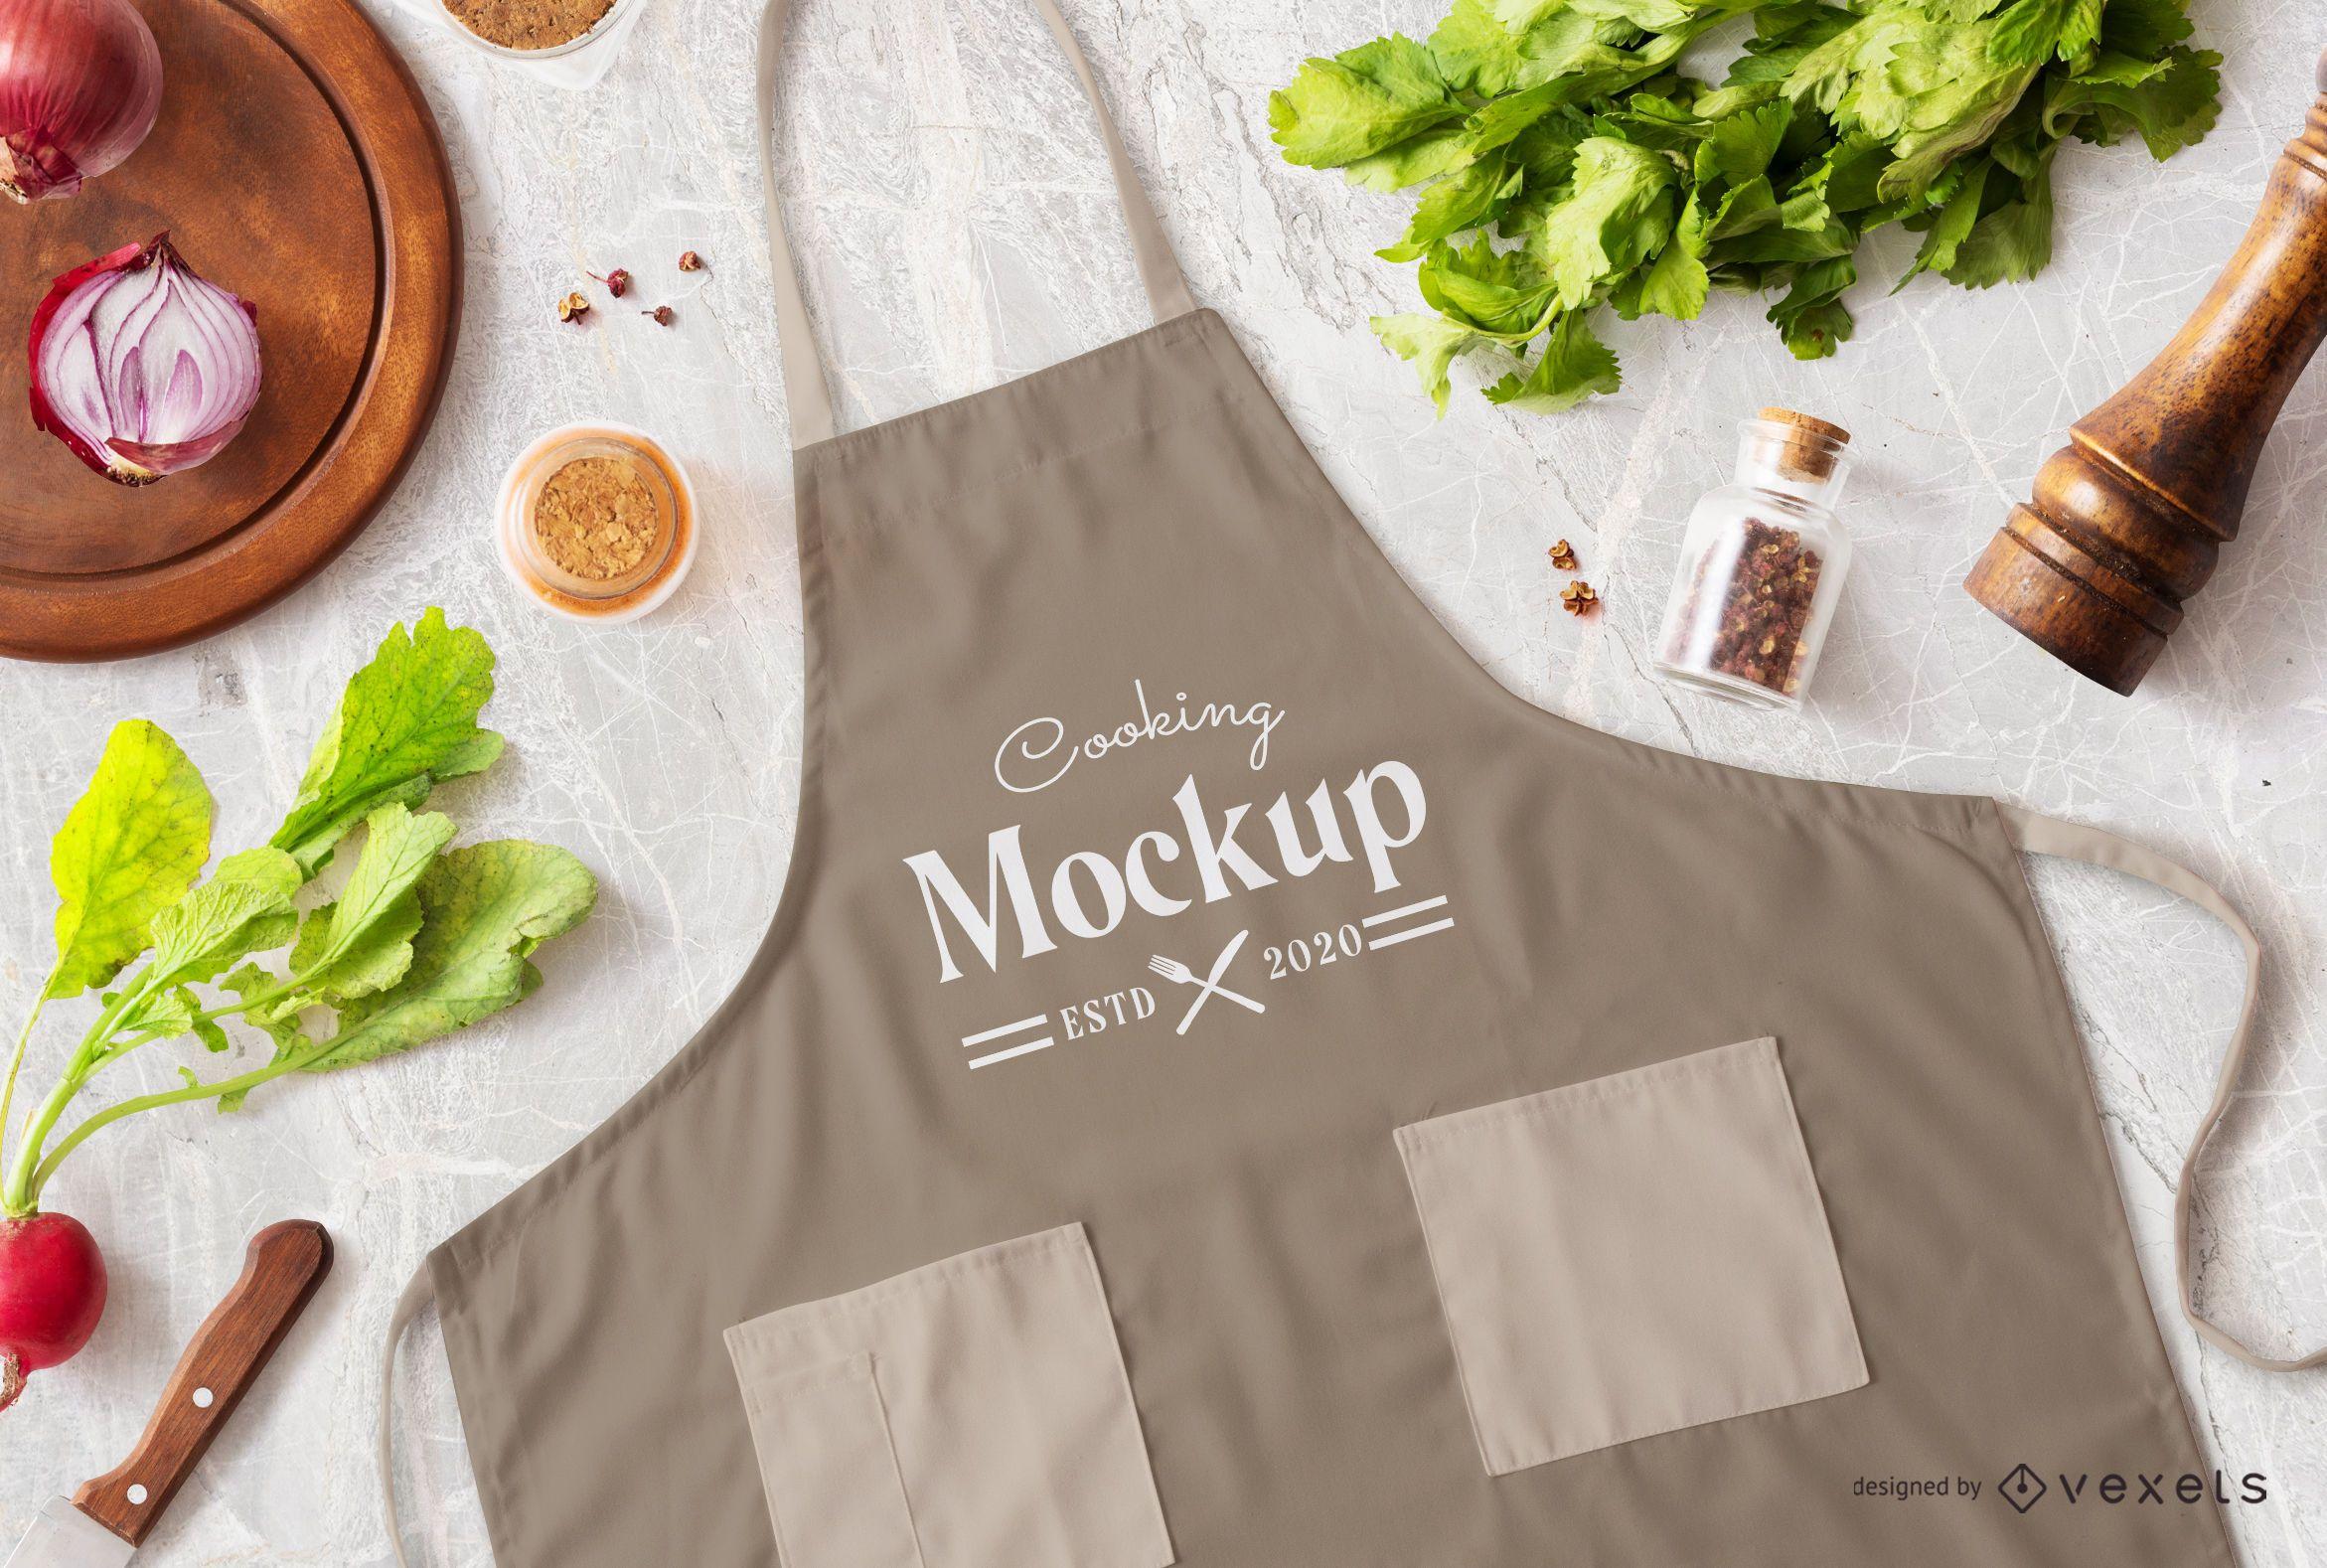 Mockup-Zusammensetzung der Kochschürze